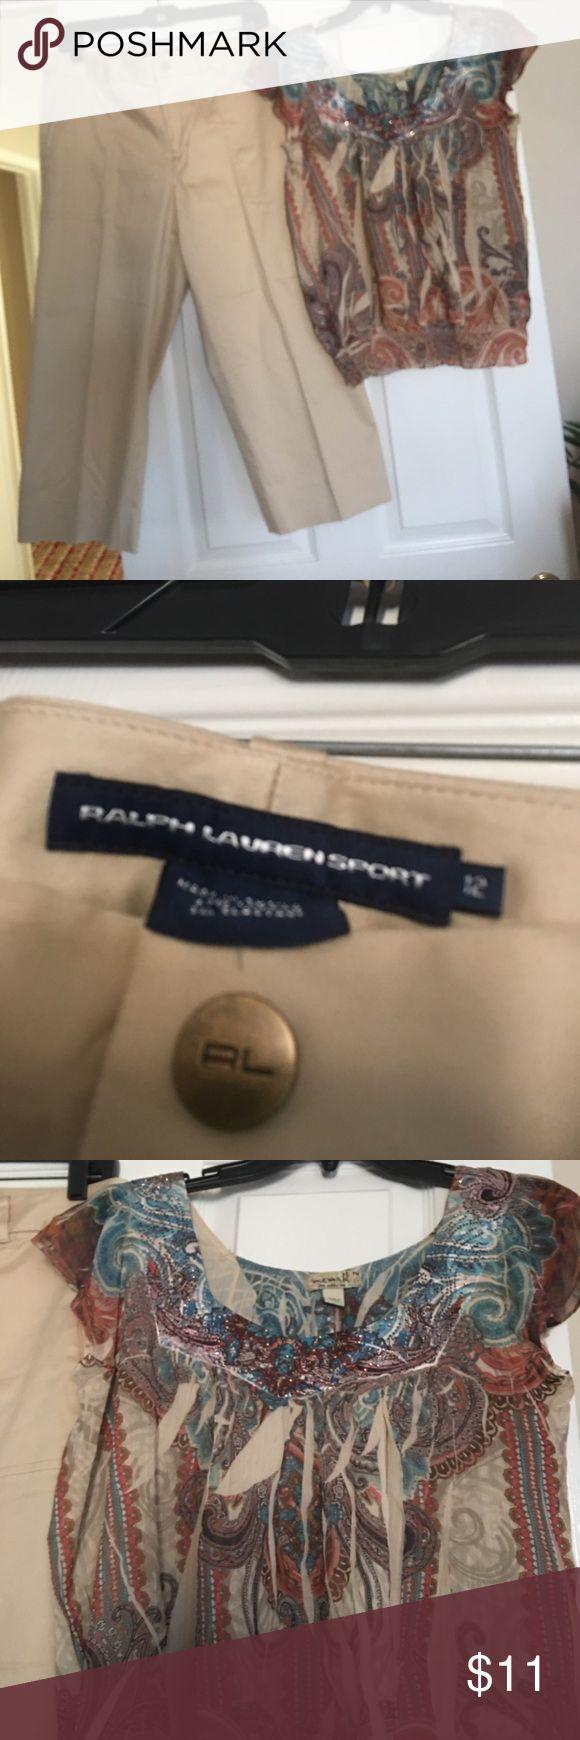 Ralp Lauren Capri Pants and free top Never worn cotton crop pants and this gorgeous top is all yours just in time for summer Lauren Ralph Lauren Pants Capris